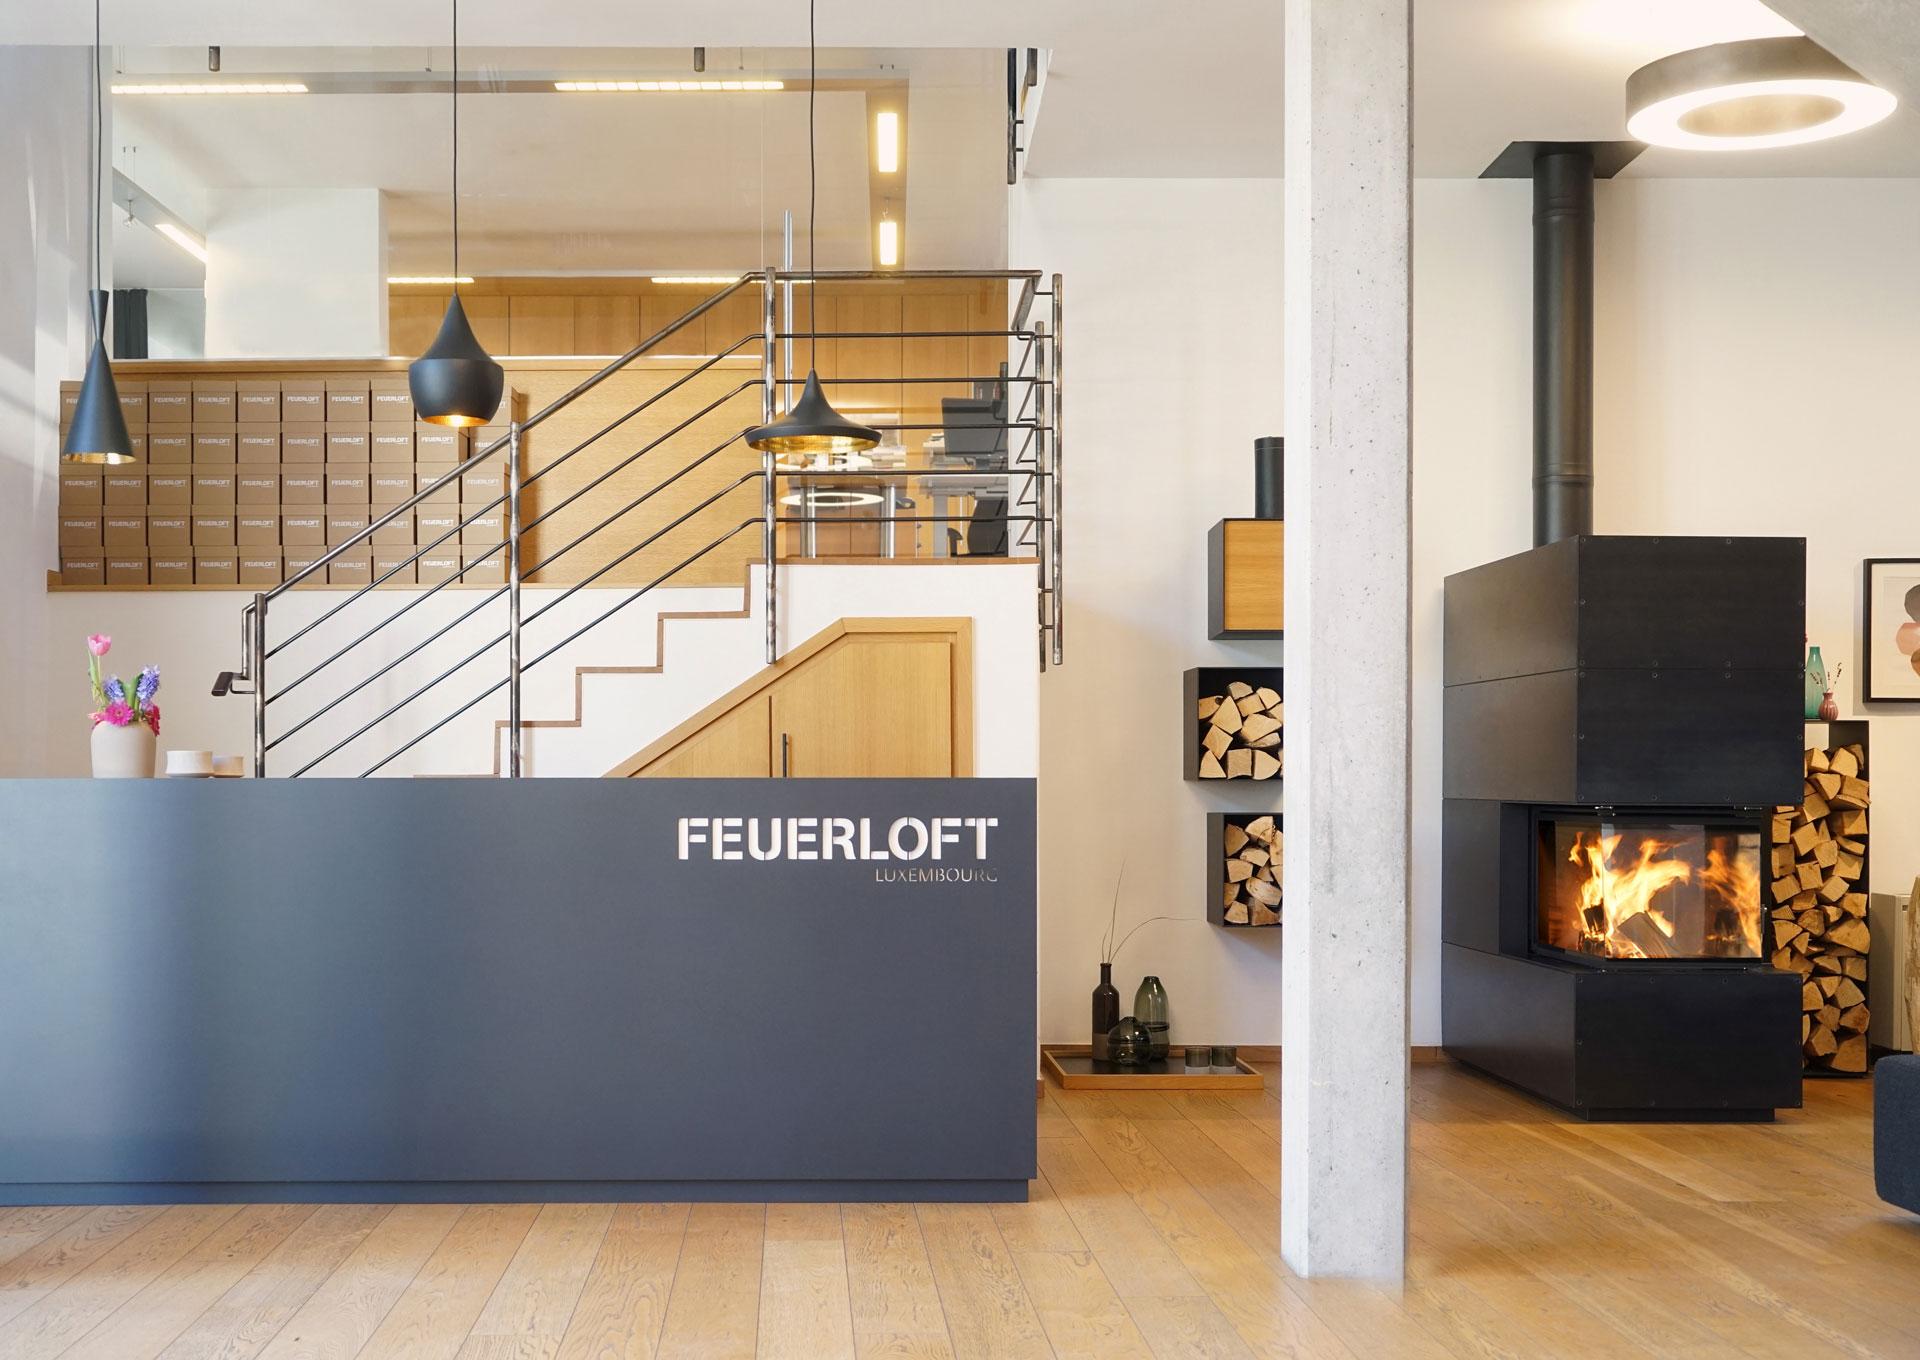 Feuerloft